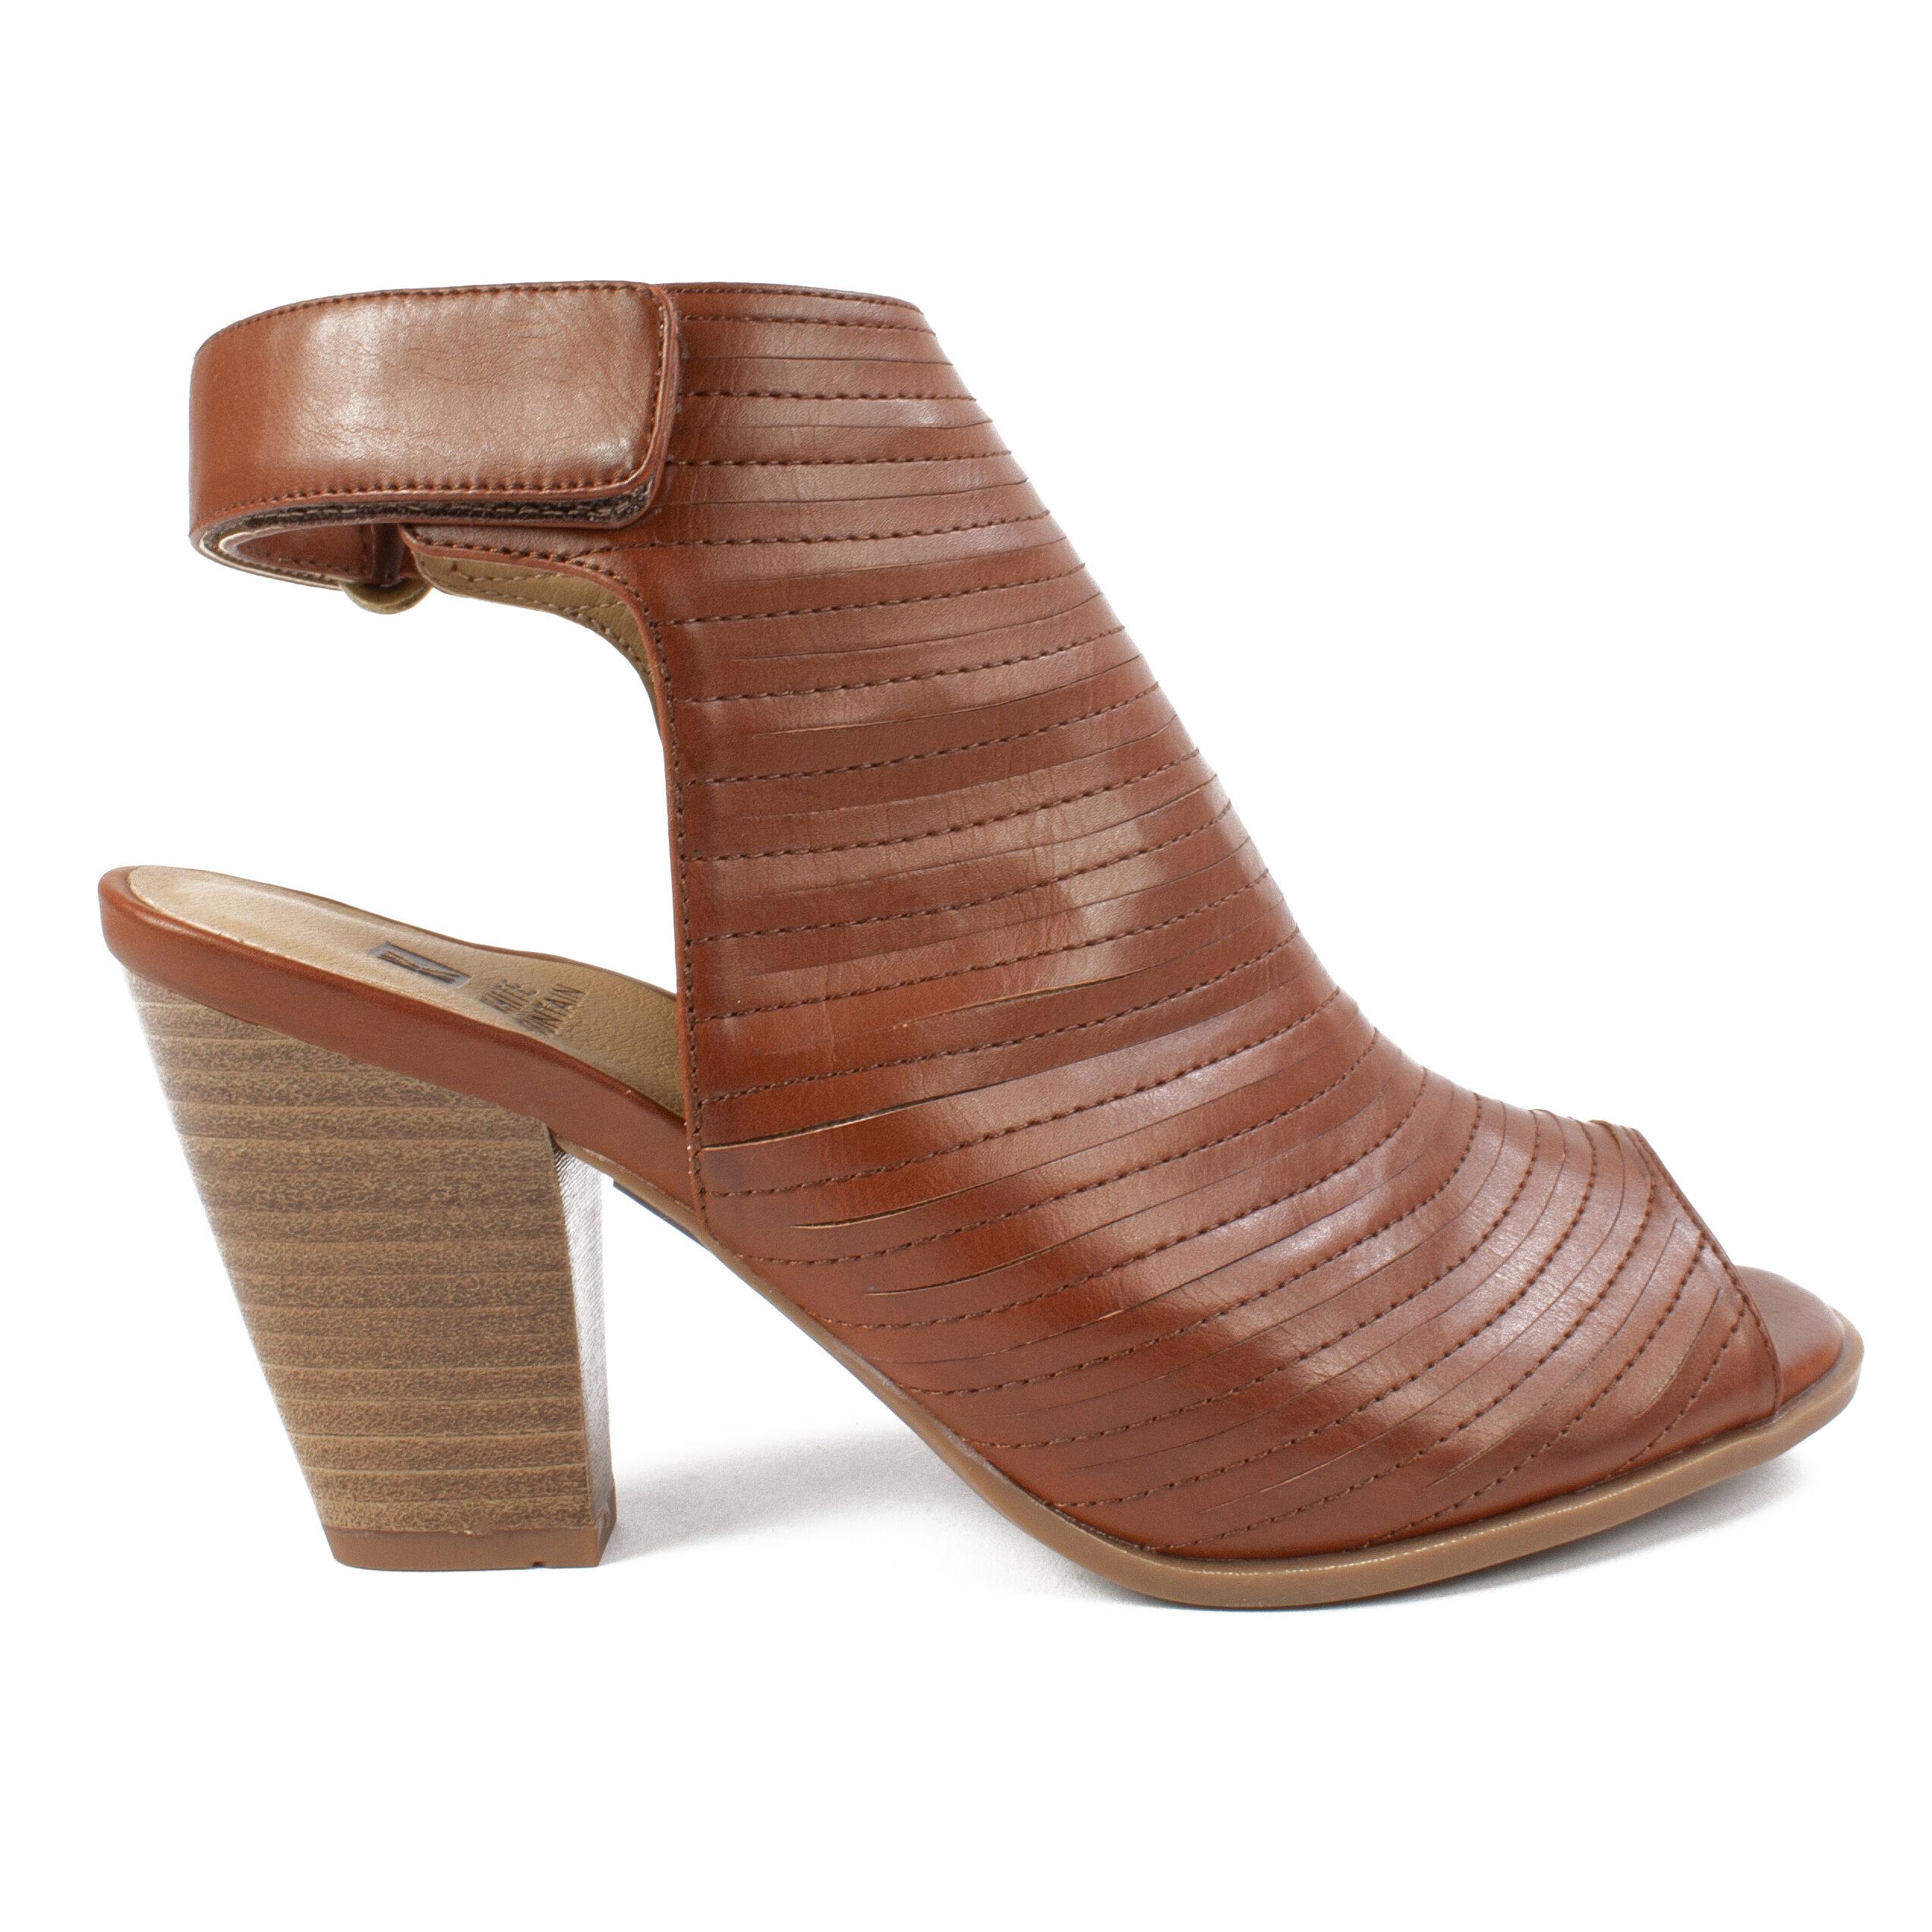 uk shoes_kd3615